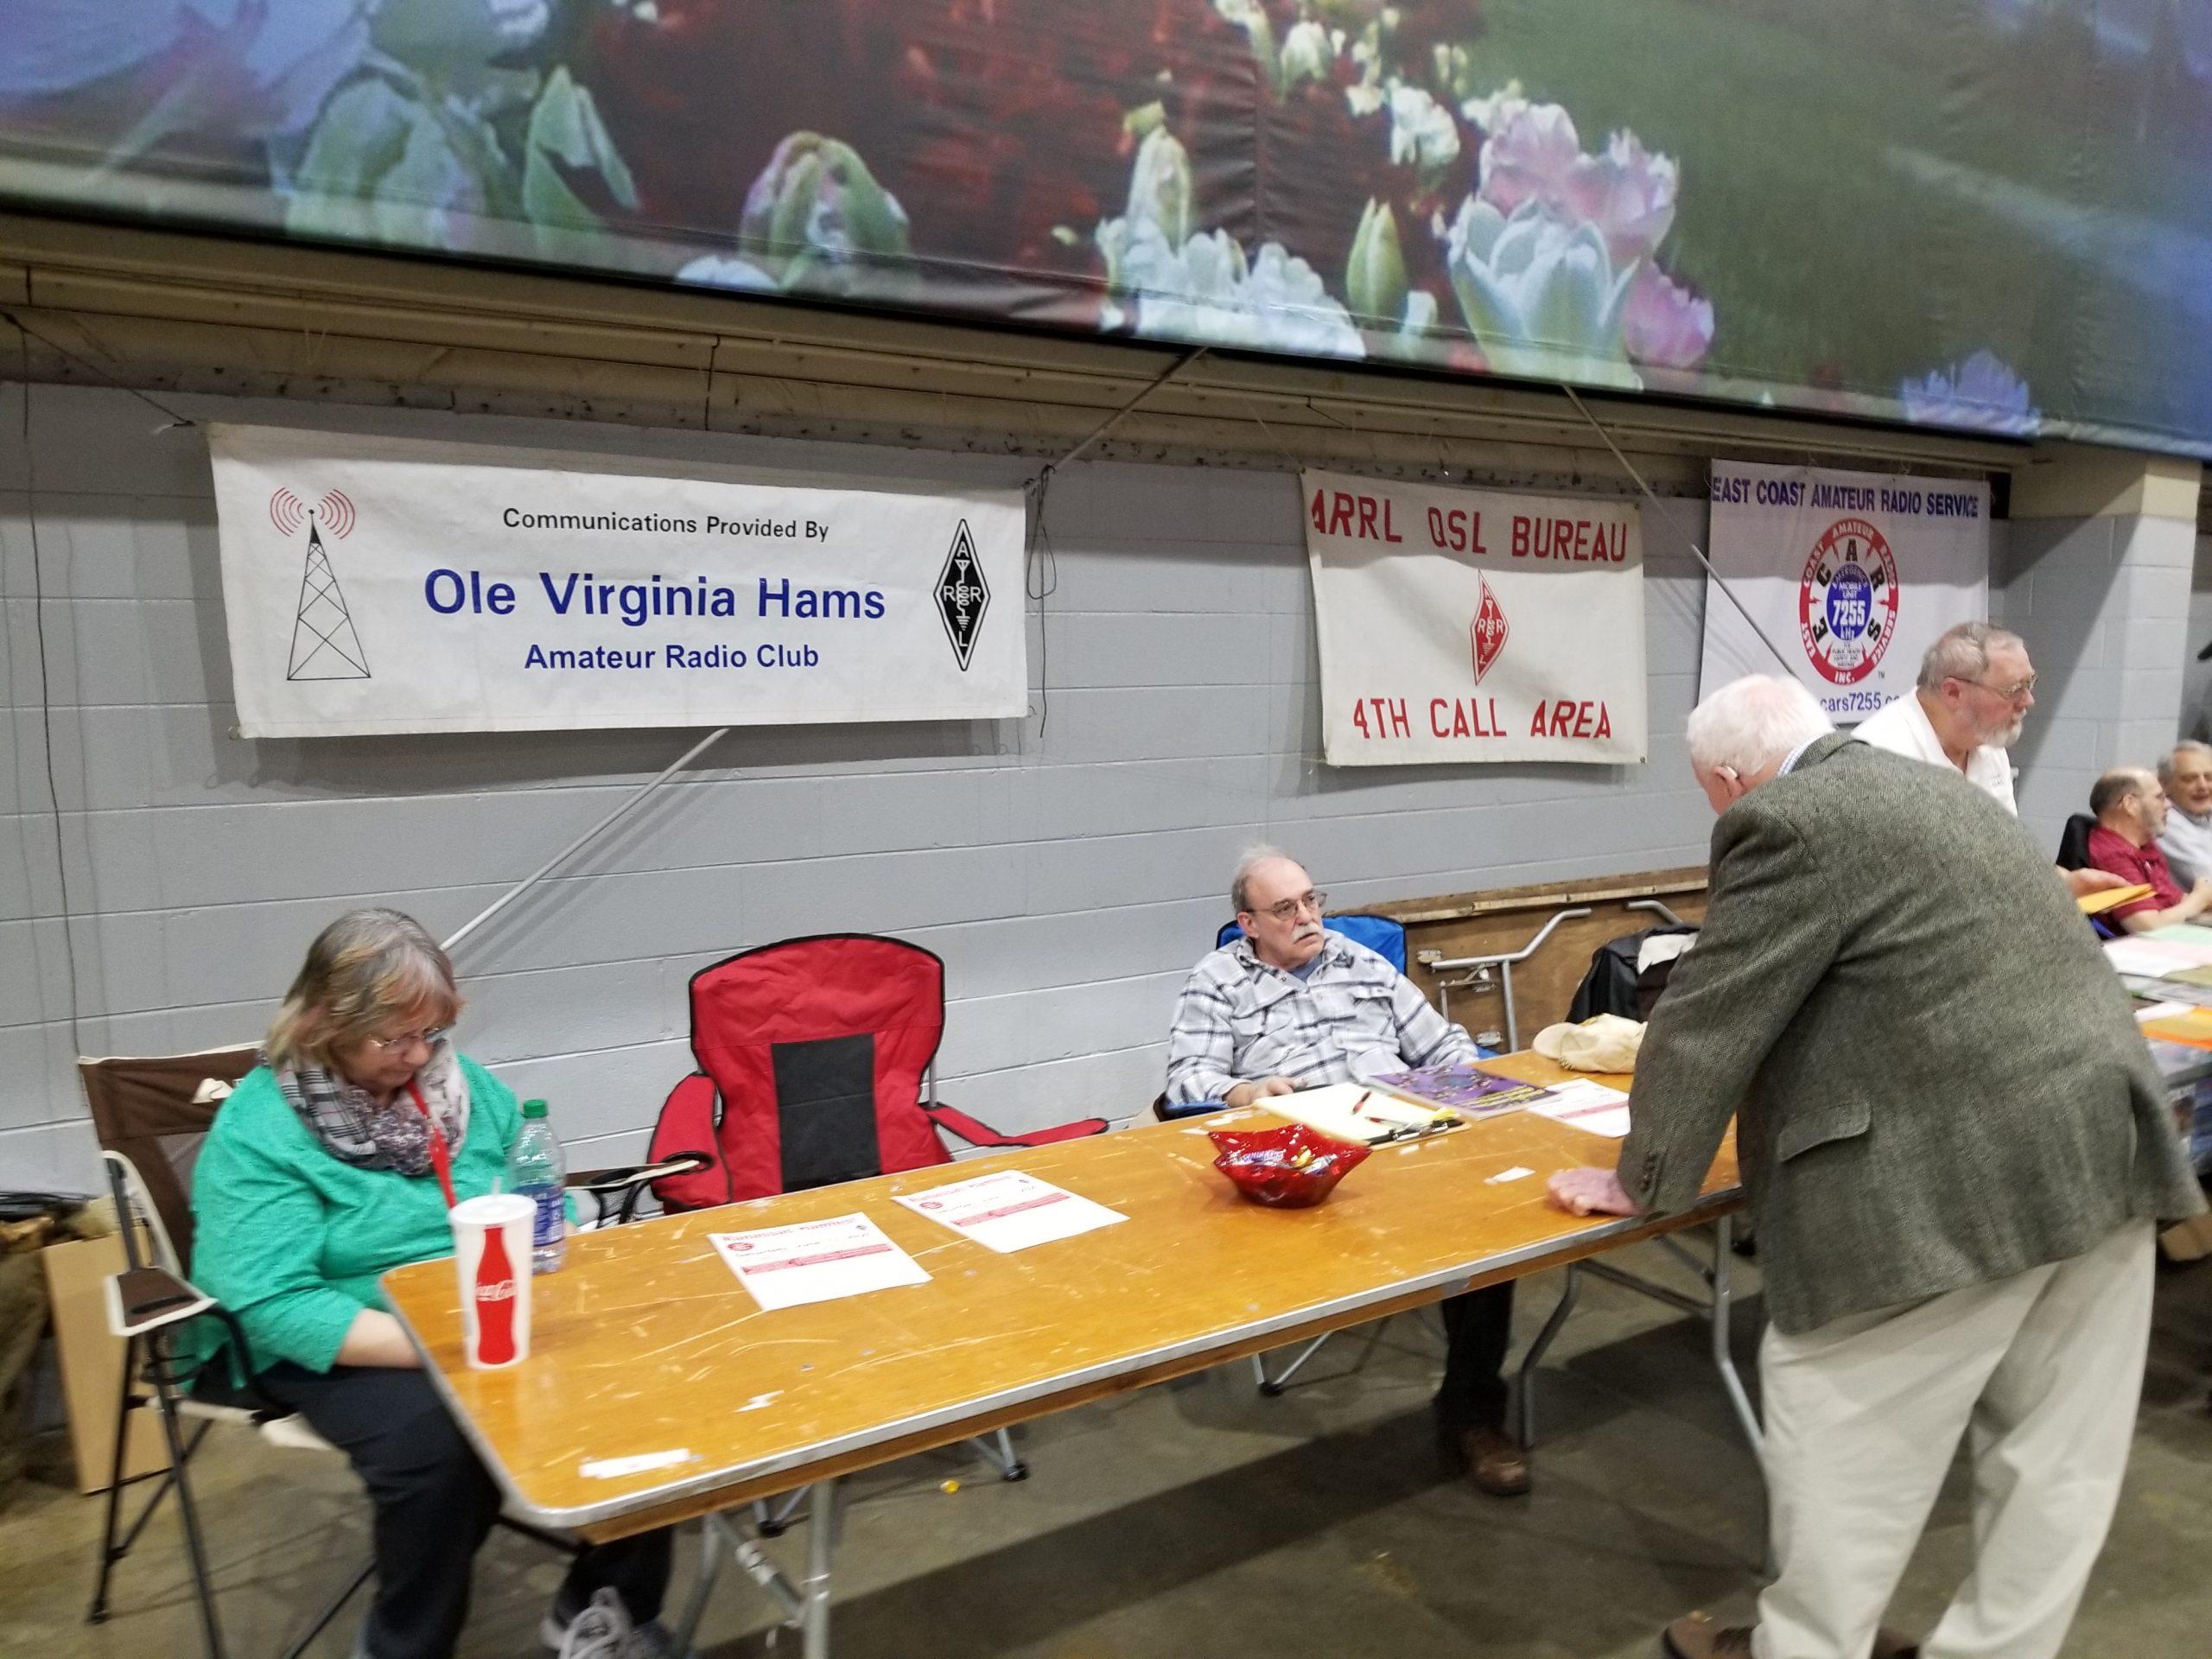 OVH table at Richmond Hamfest